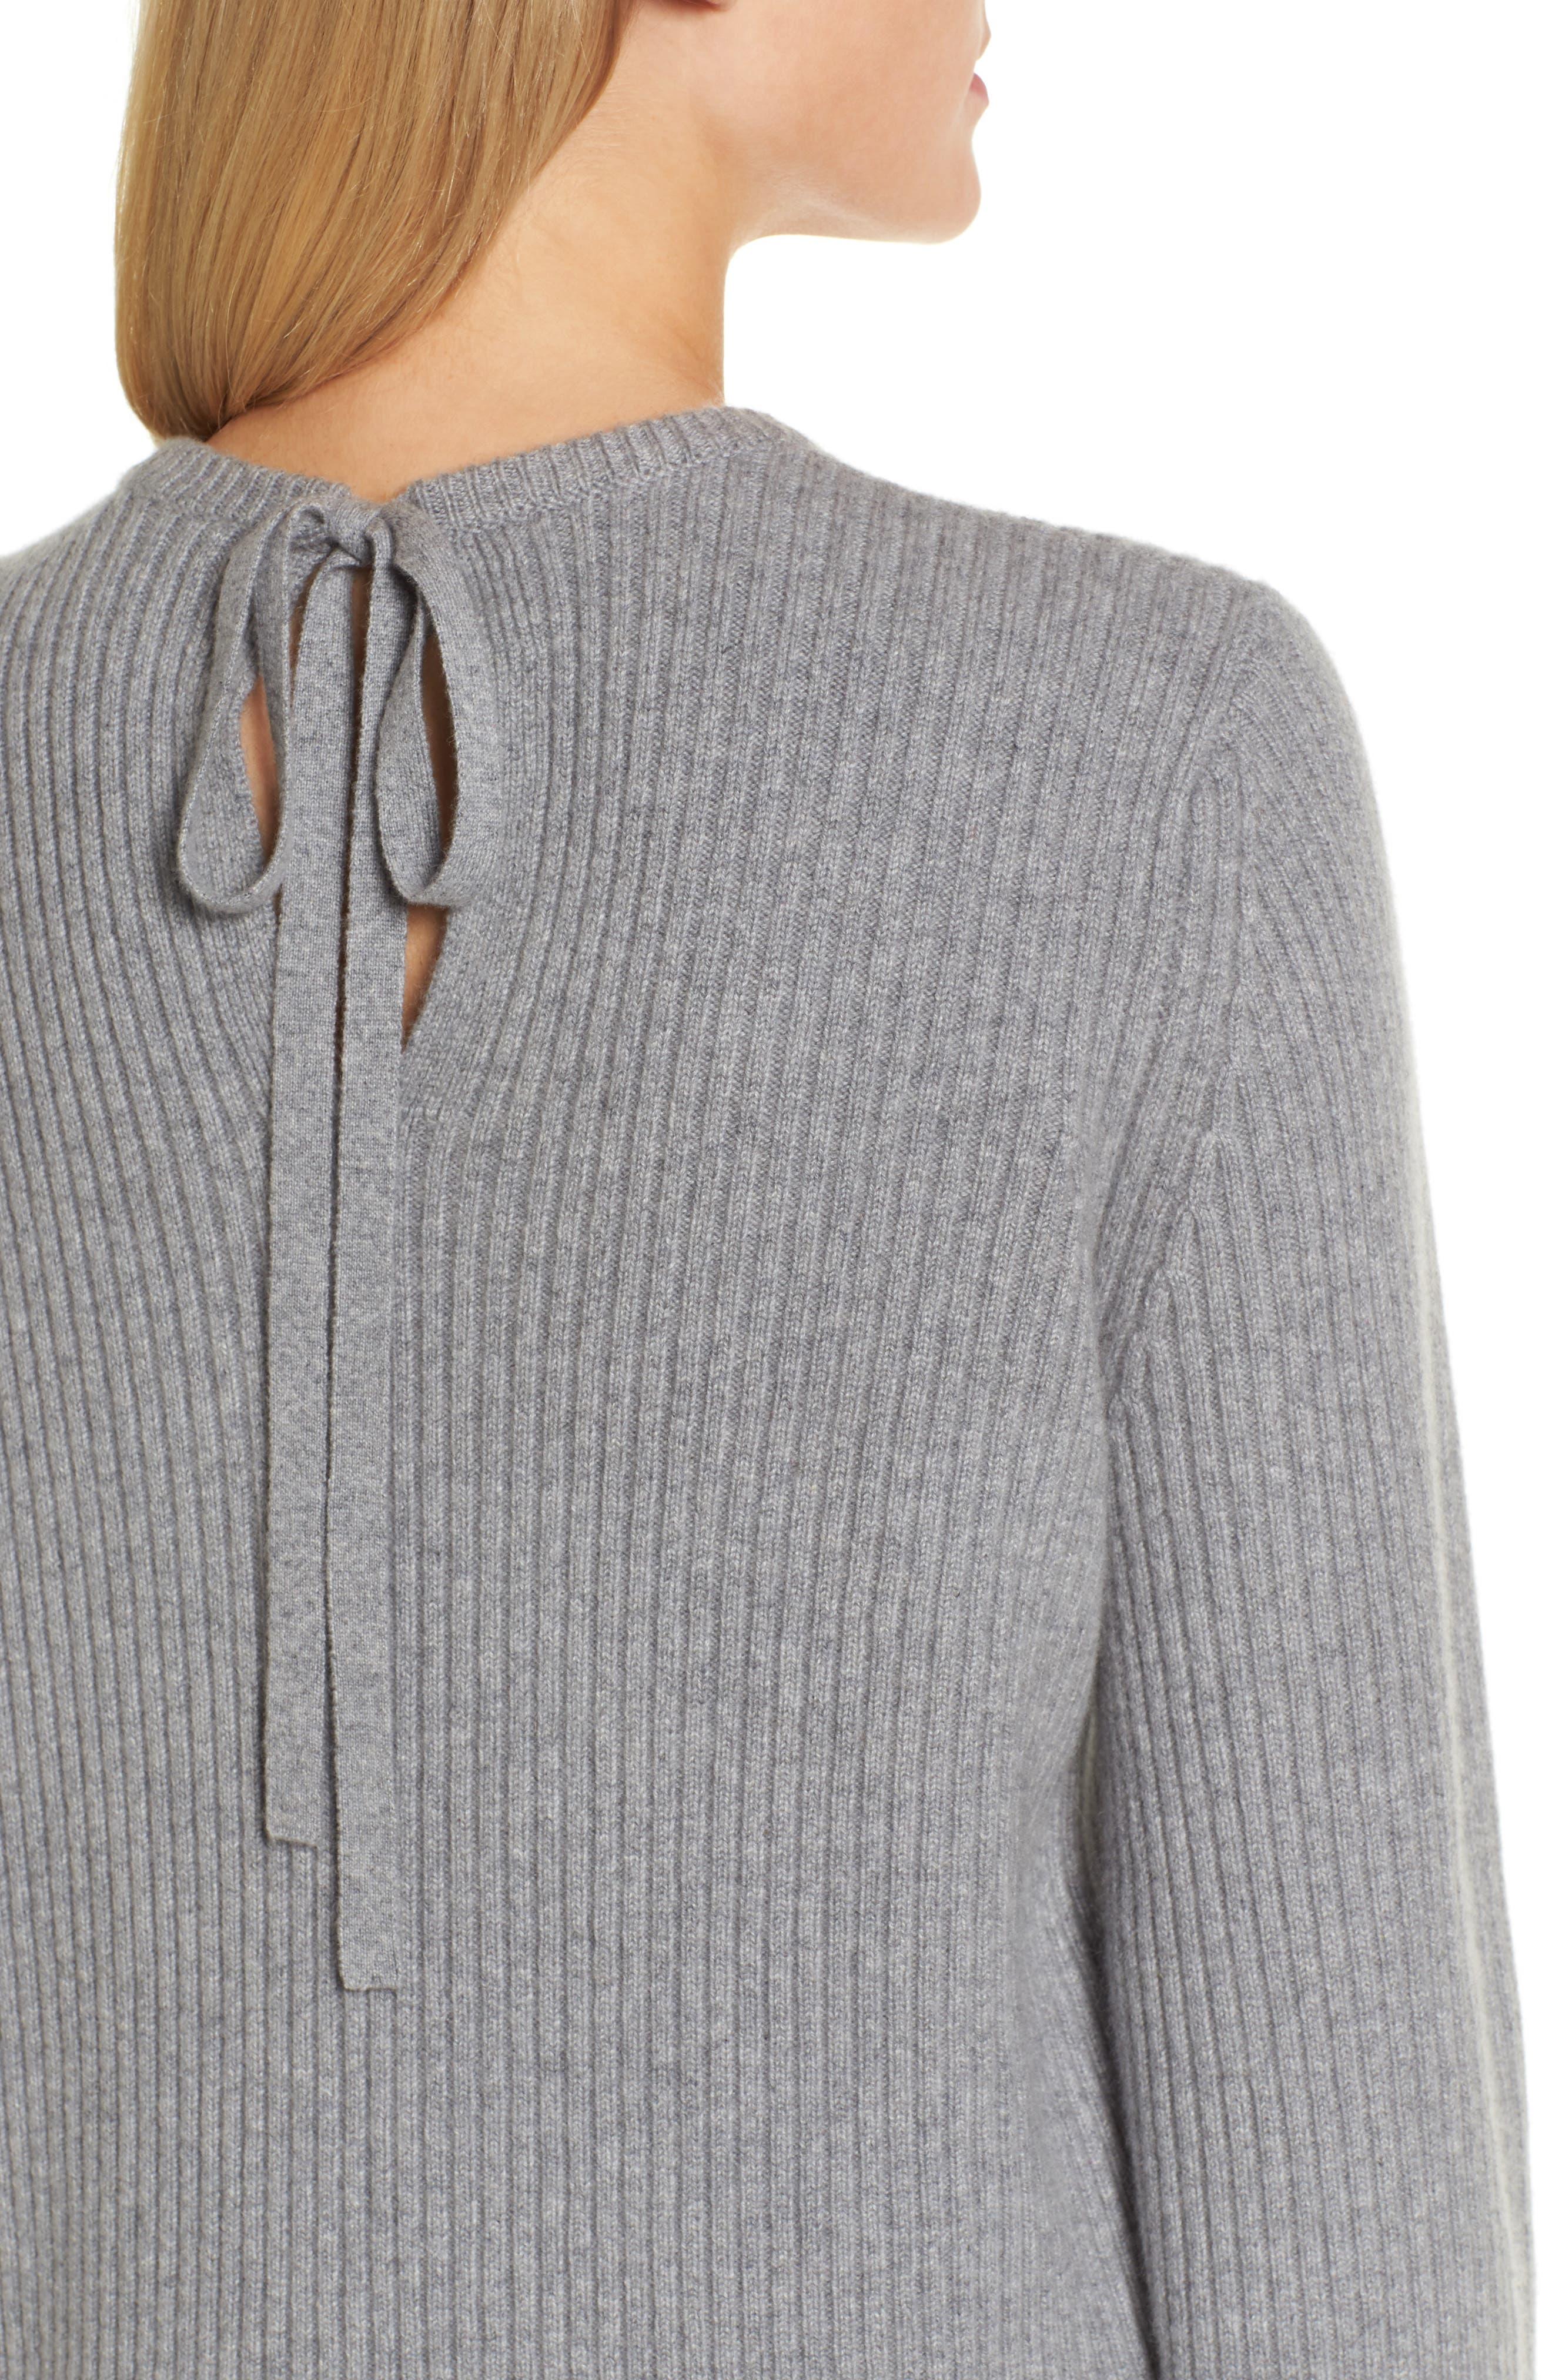 Tie Back Cashmere Blend Sweater,                             Alternate thumbnail 4, color,                             030